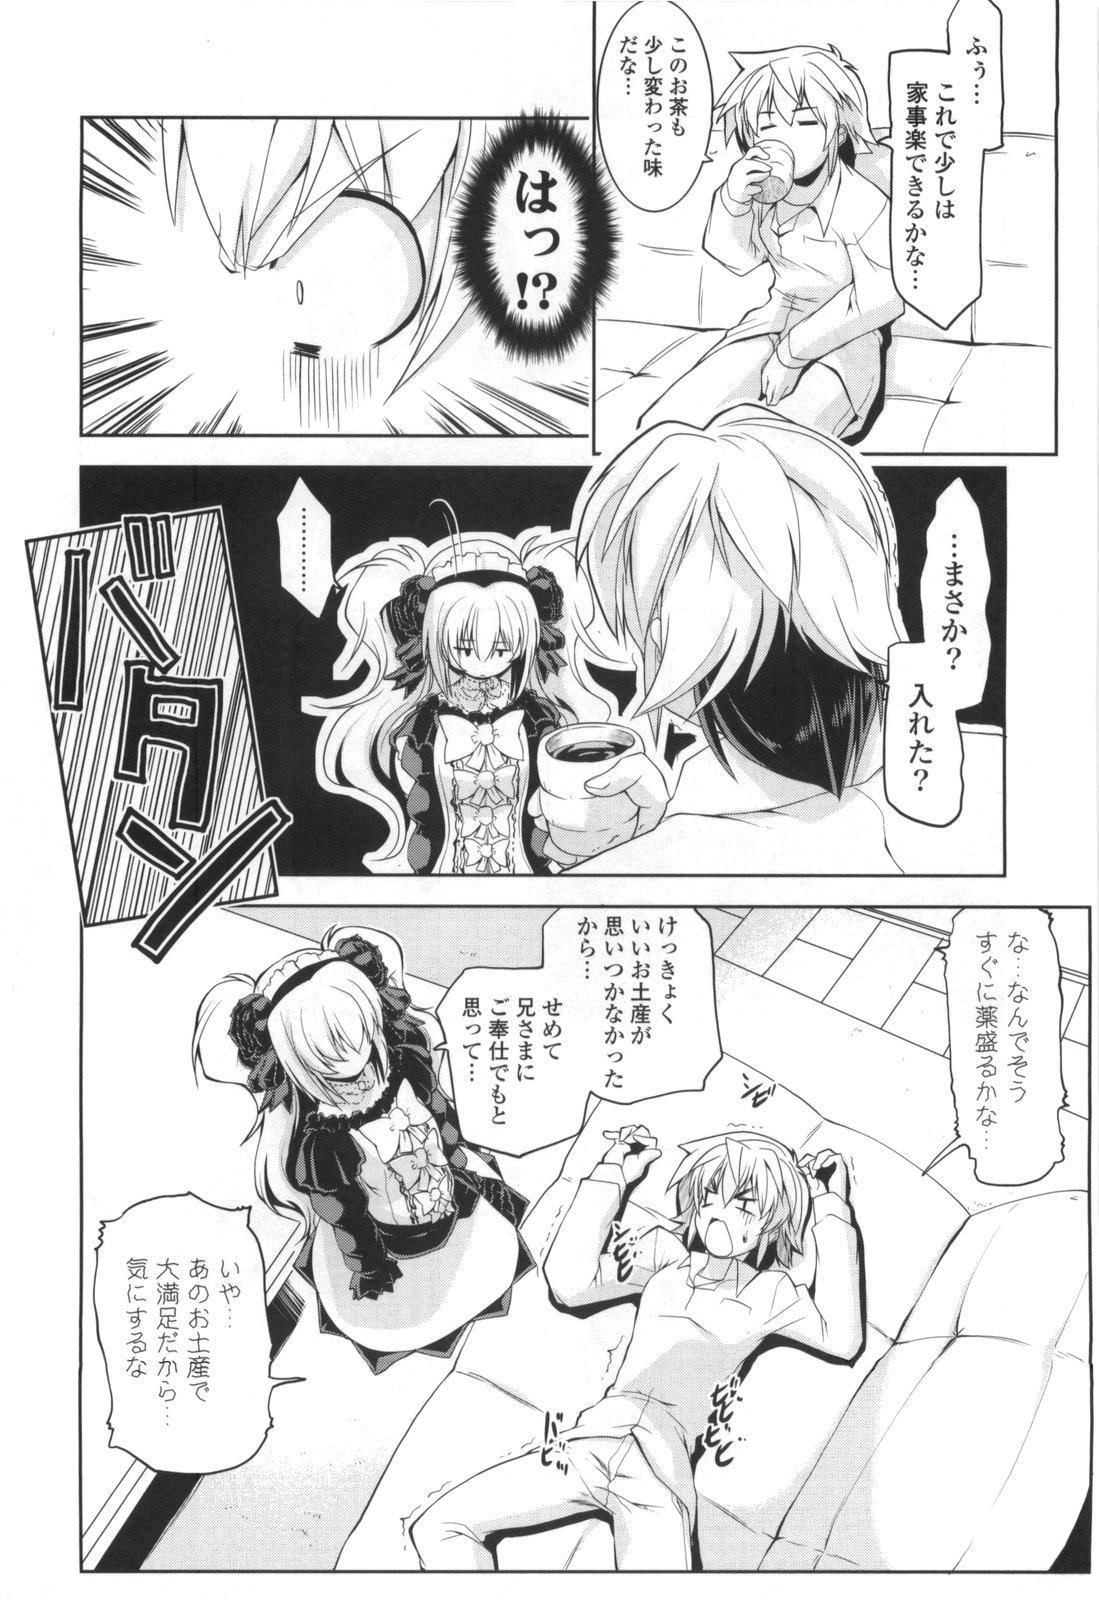 [Gyonikun] Gosyujin-sama Senyou!? Ami-sama Senyou 101